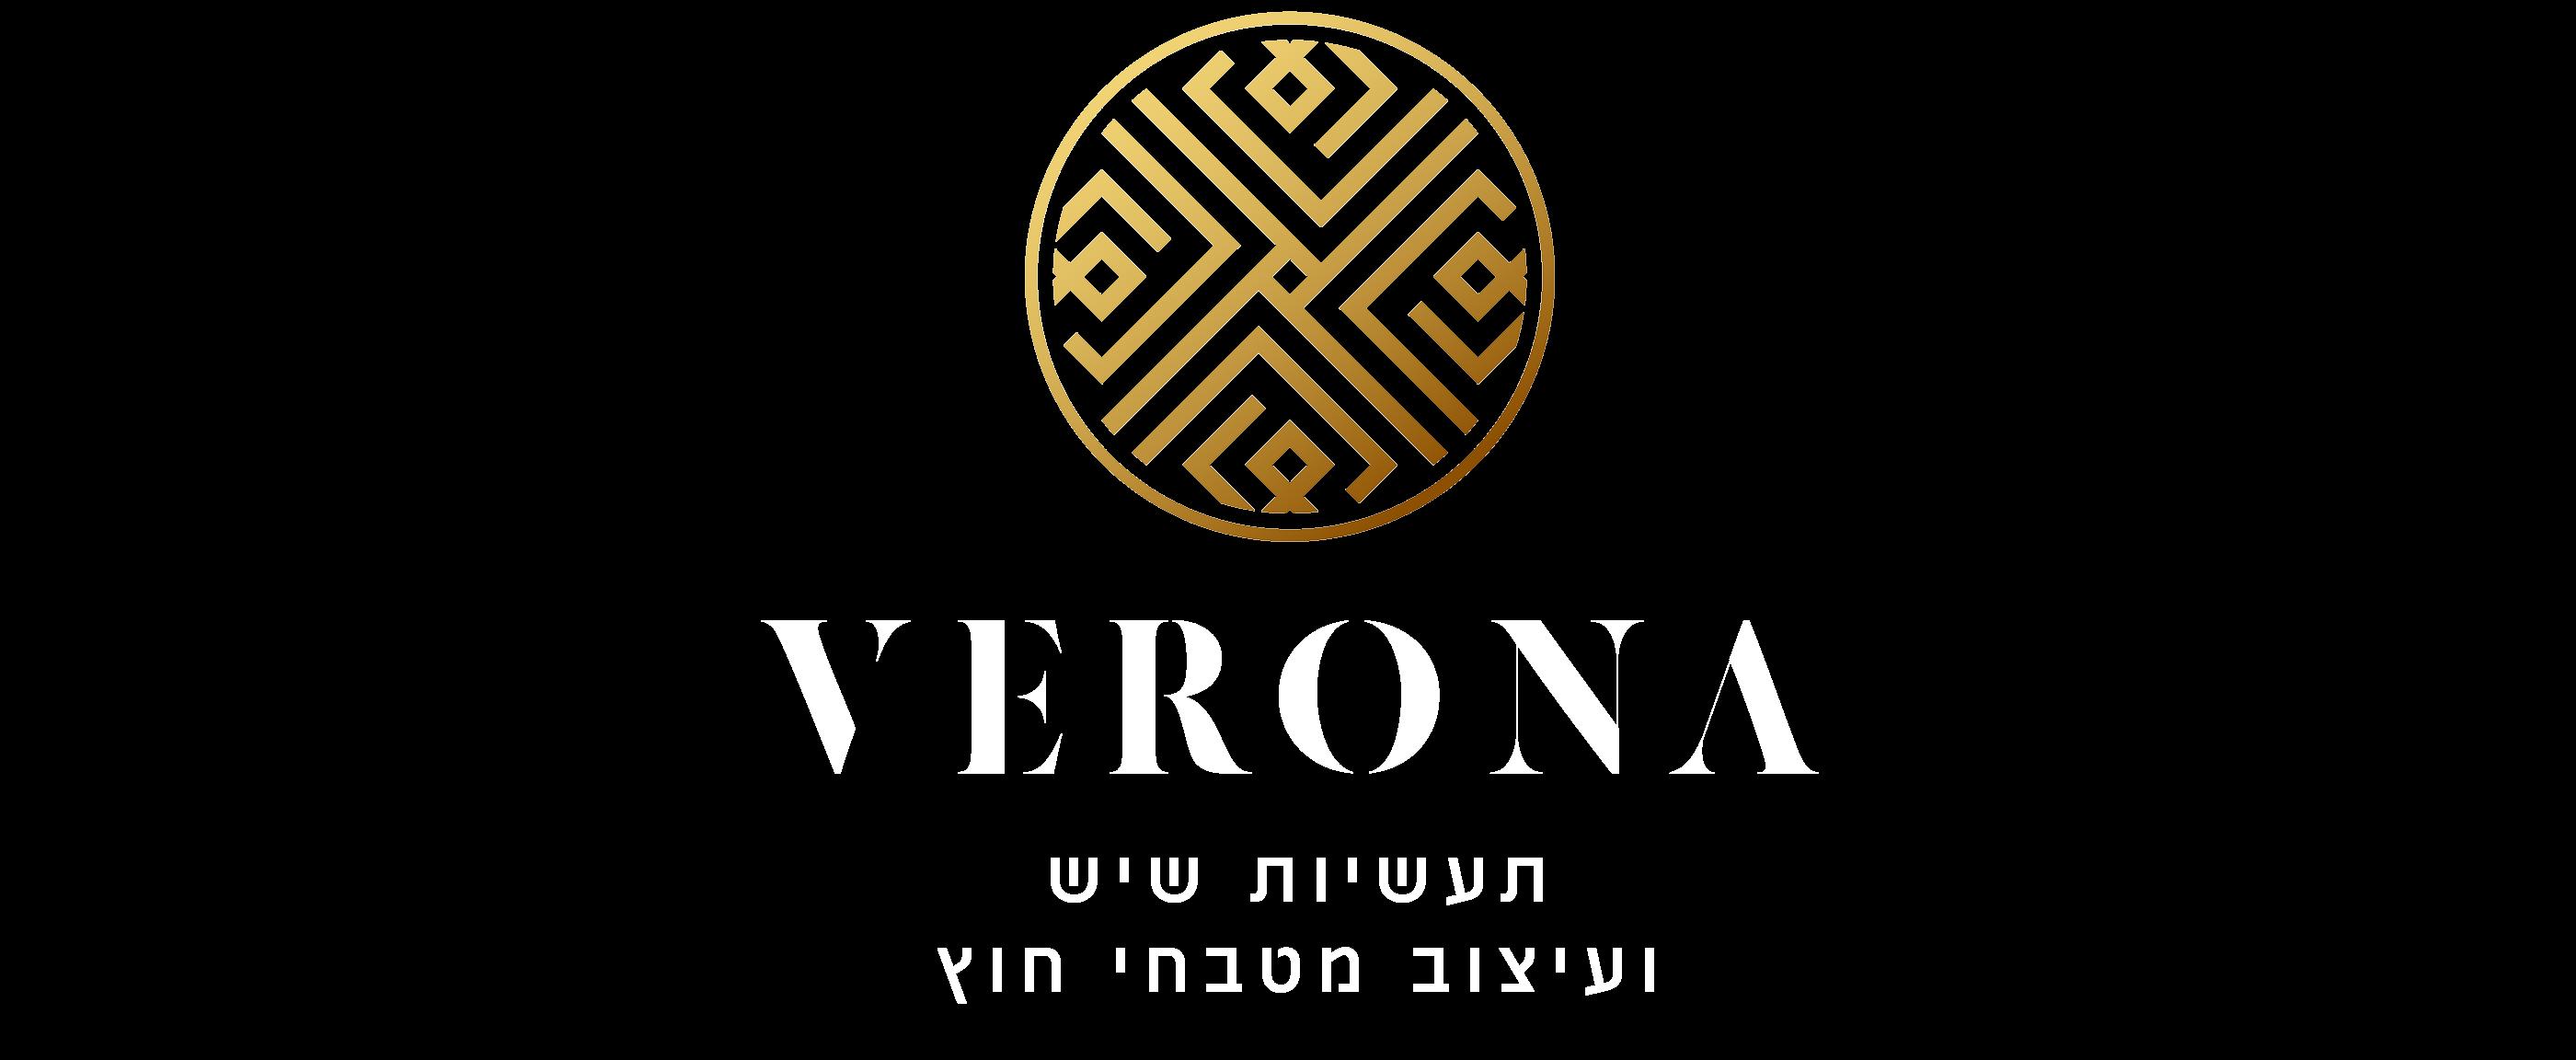 cropped-לוגו-תעשיות-שיש-ומטבחי-חוץ-1-1